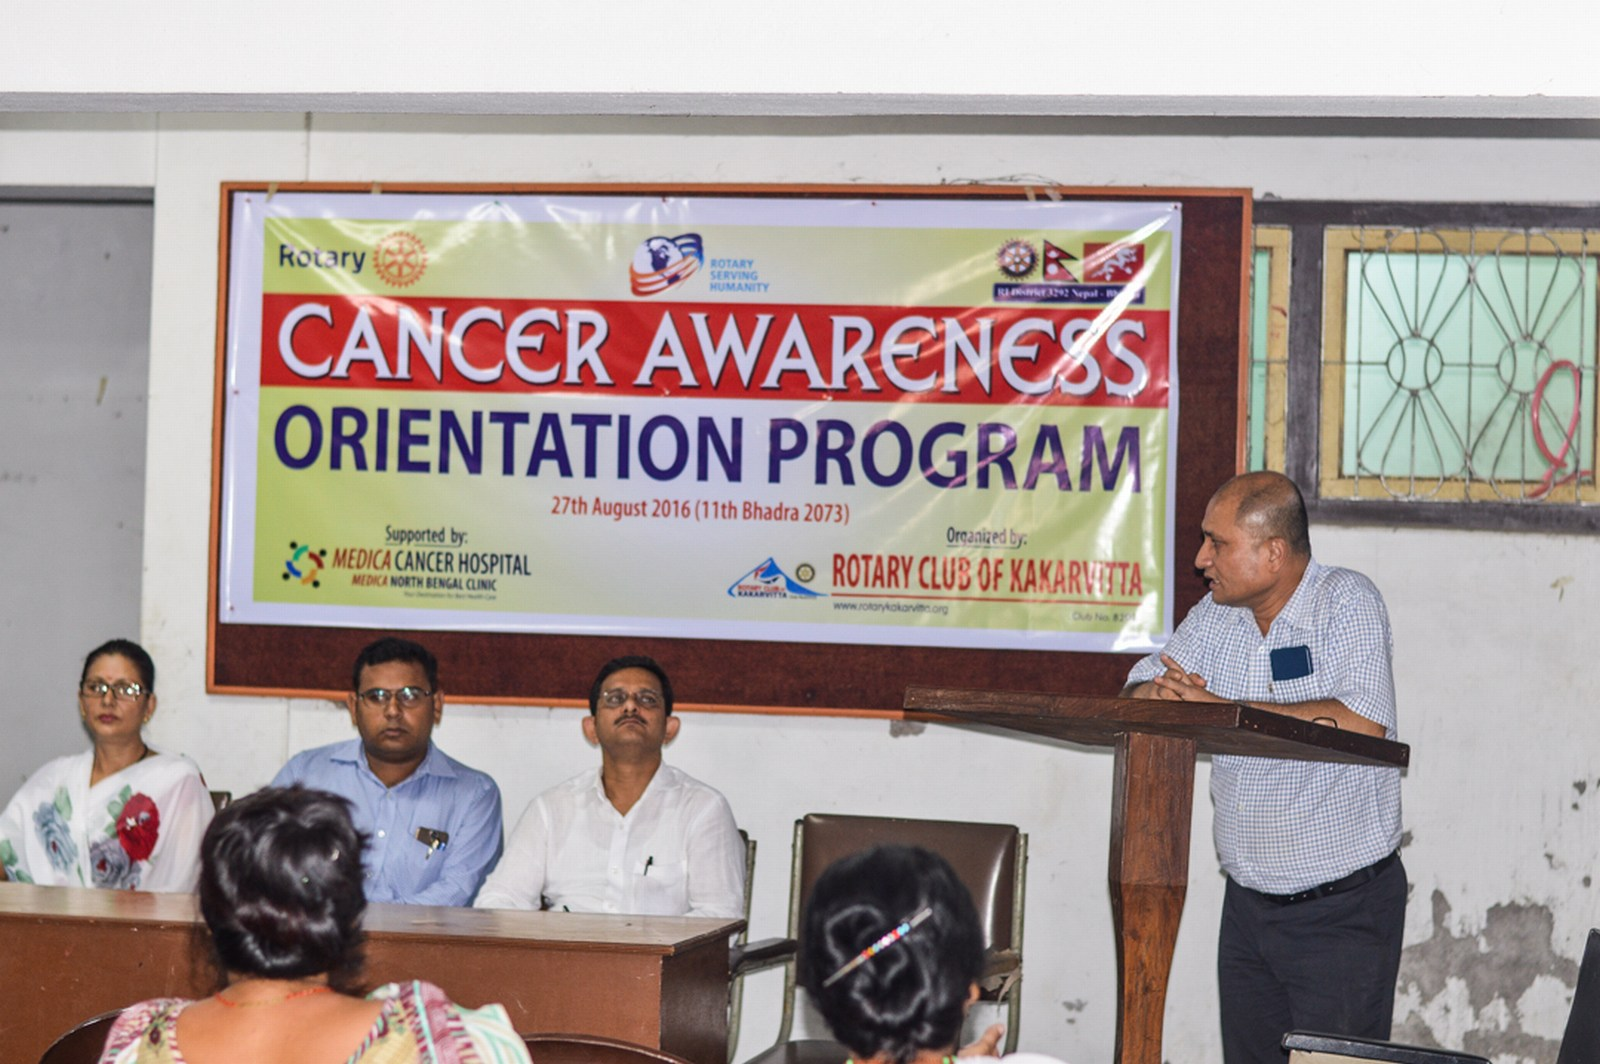 Cancer-Awareness-Orientation-Program-2016-Rotary-Club-of-Kakarvitta-9